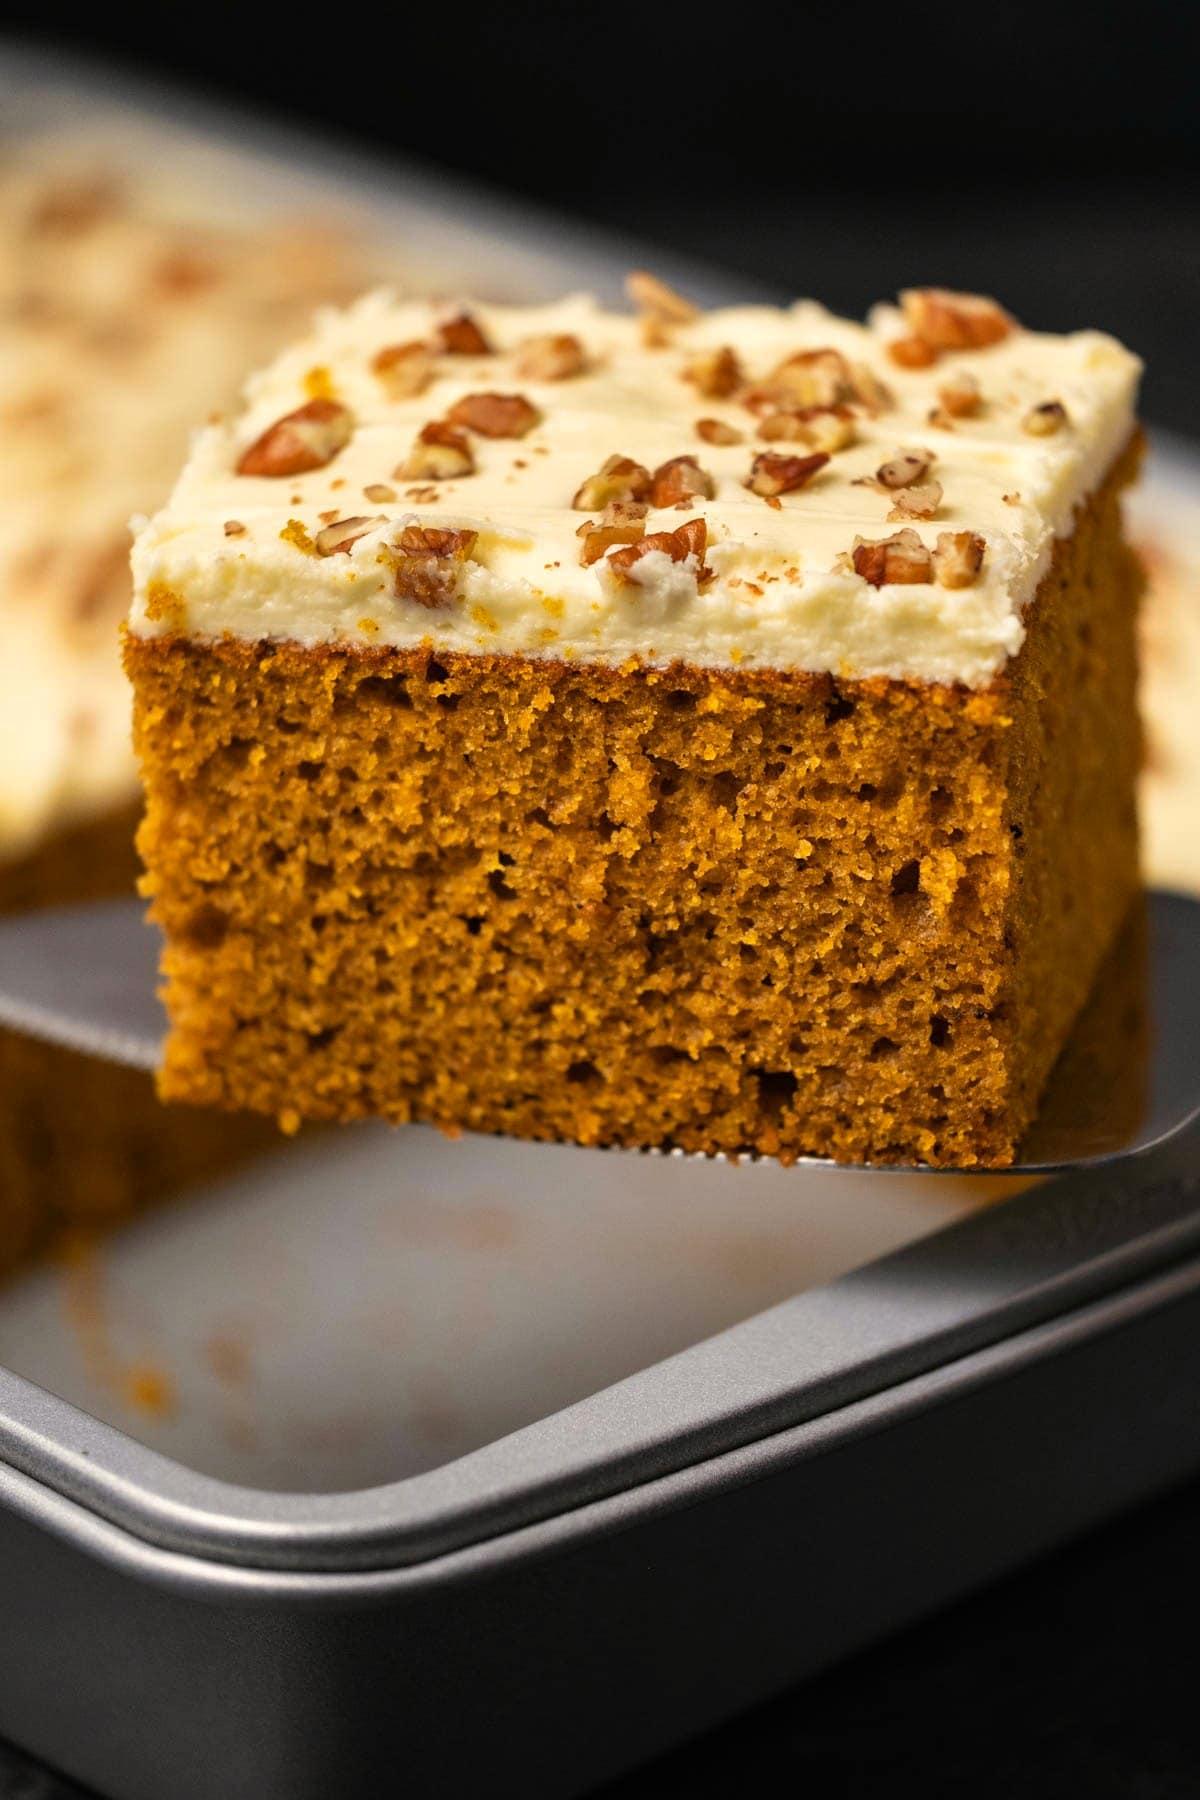 Slice of pumpkin cake on a cake lifter.